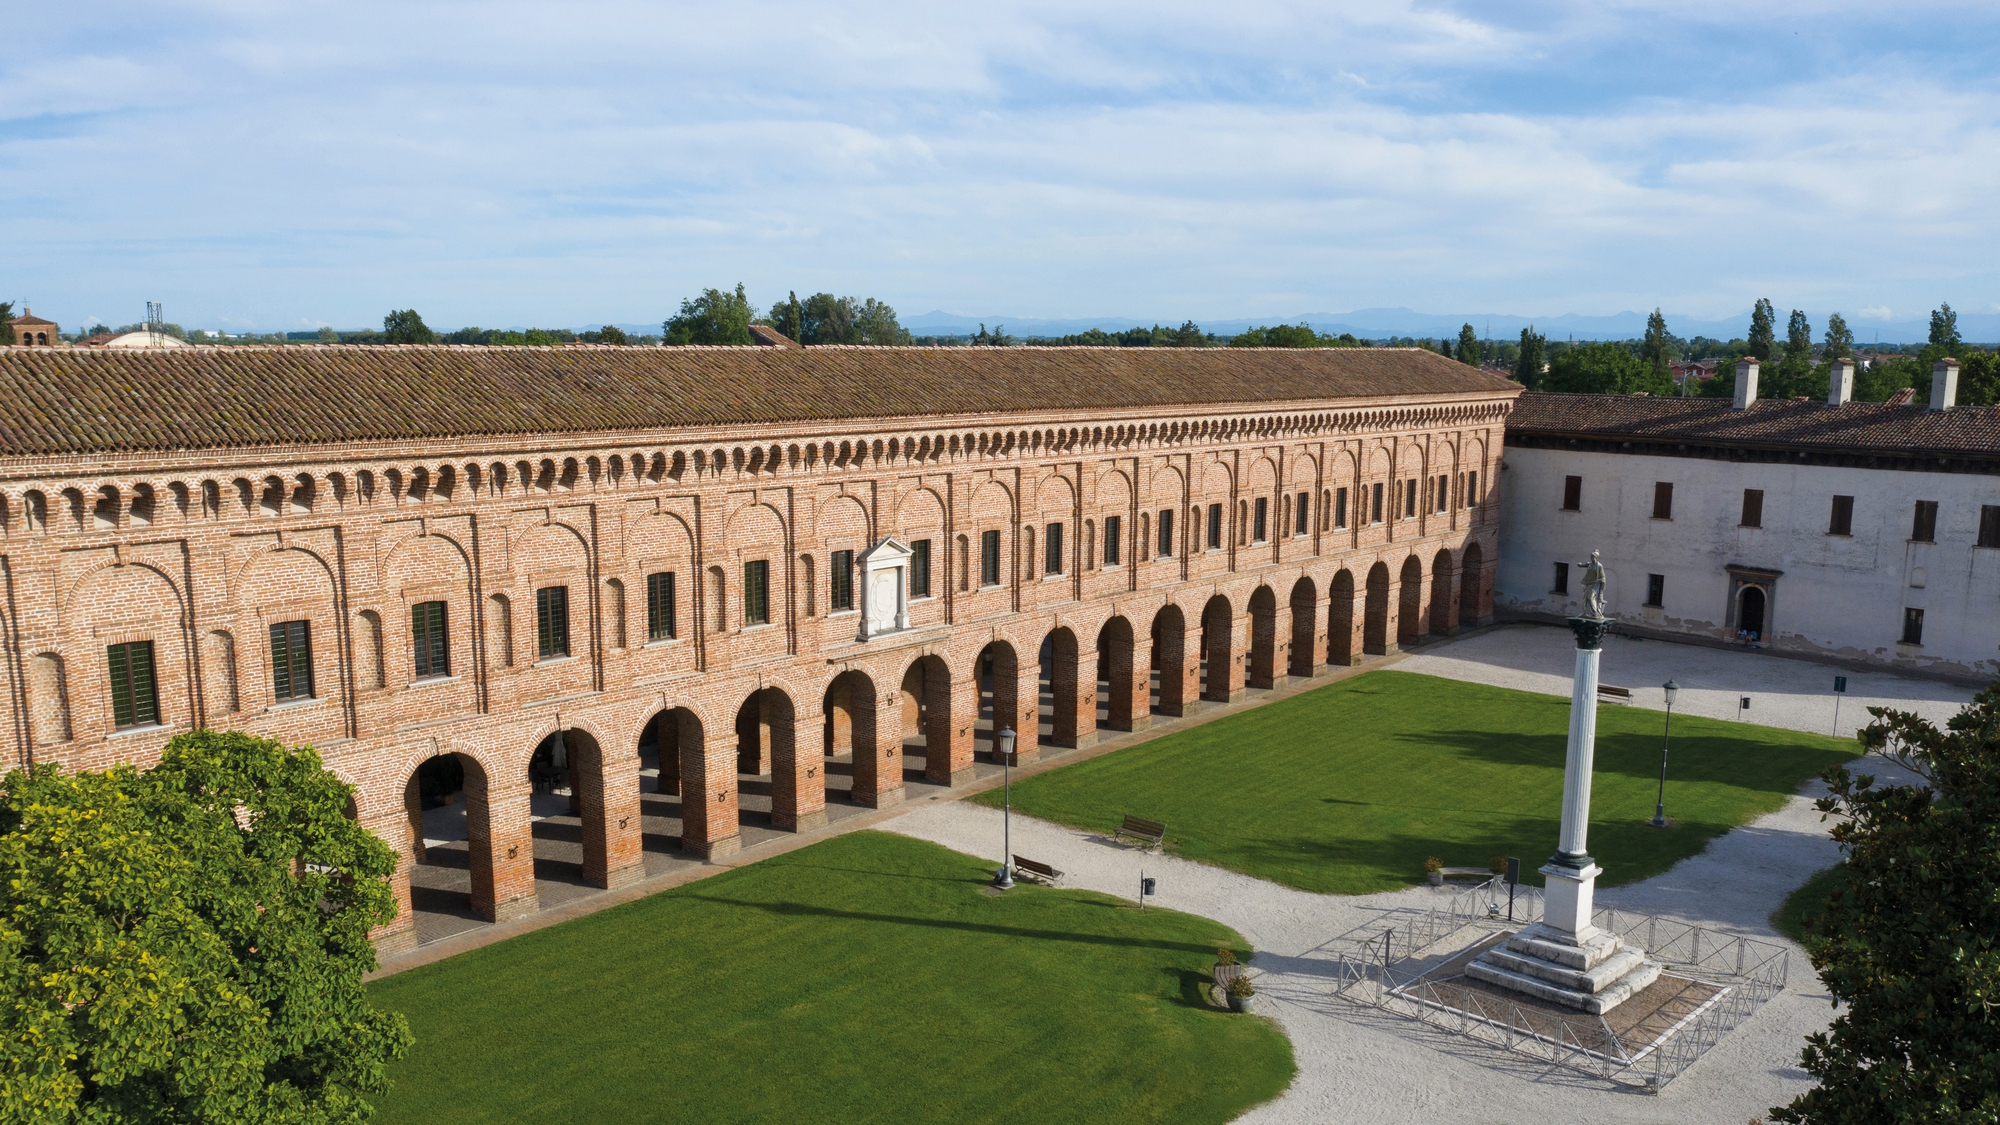 Galleria degli Antichi esterno edit.jpg